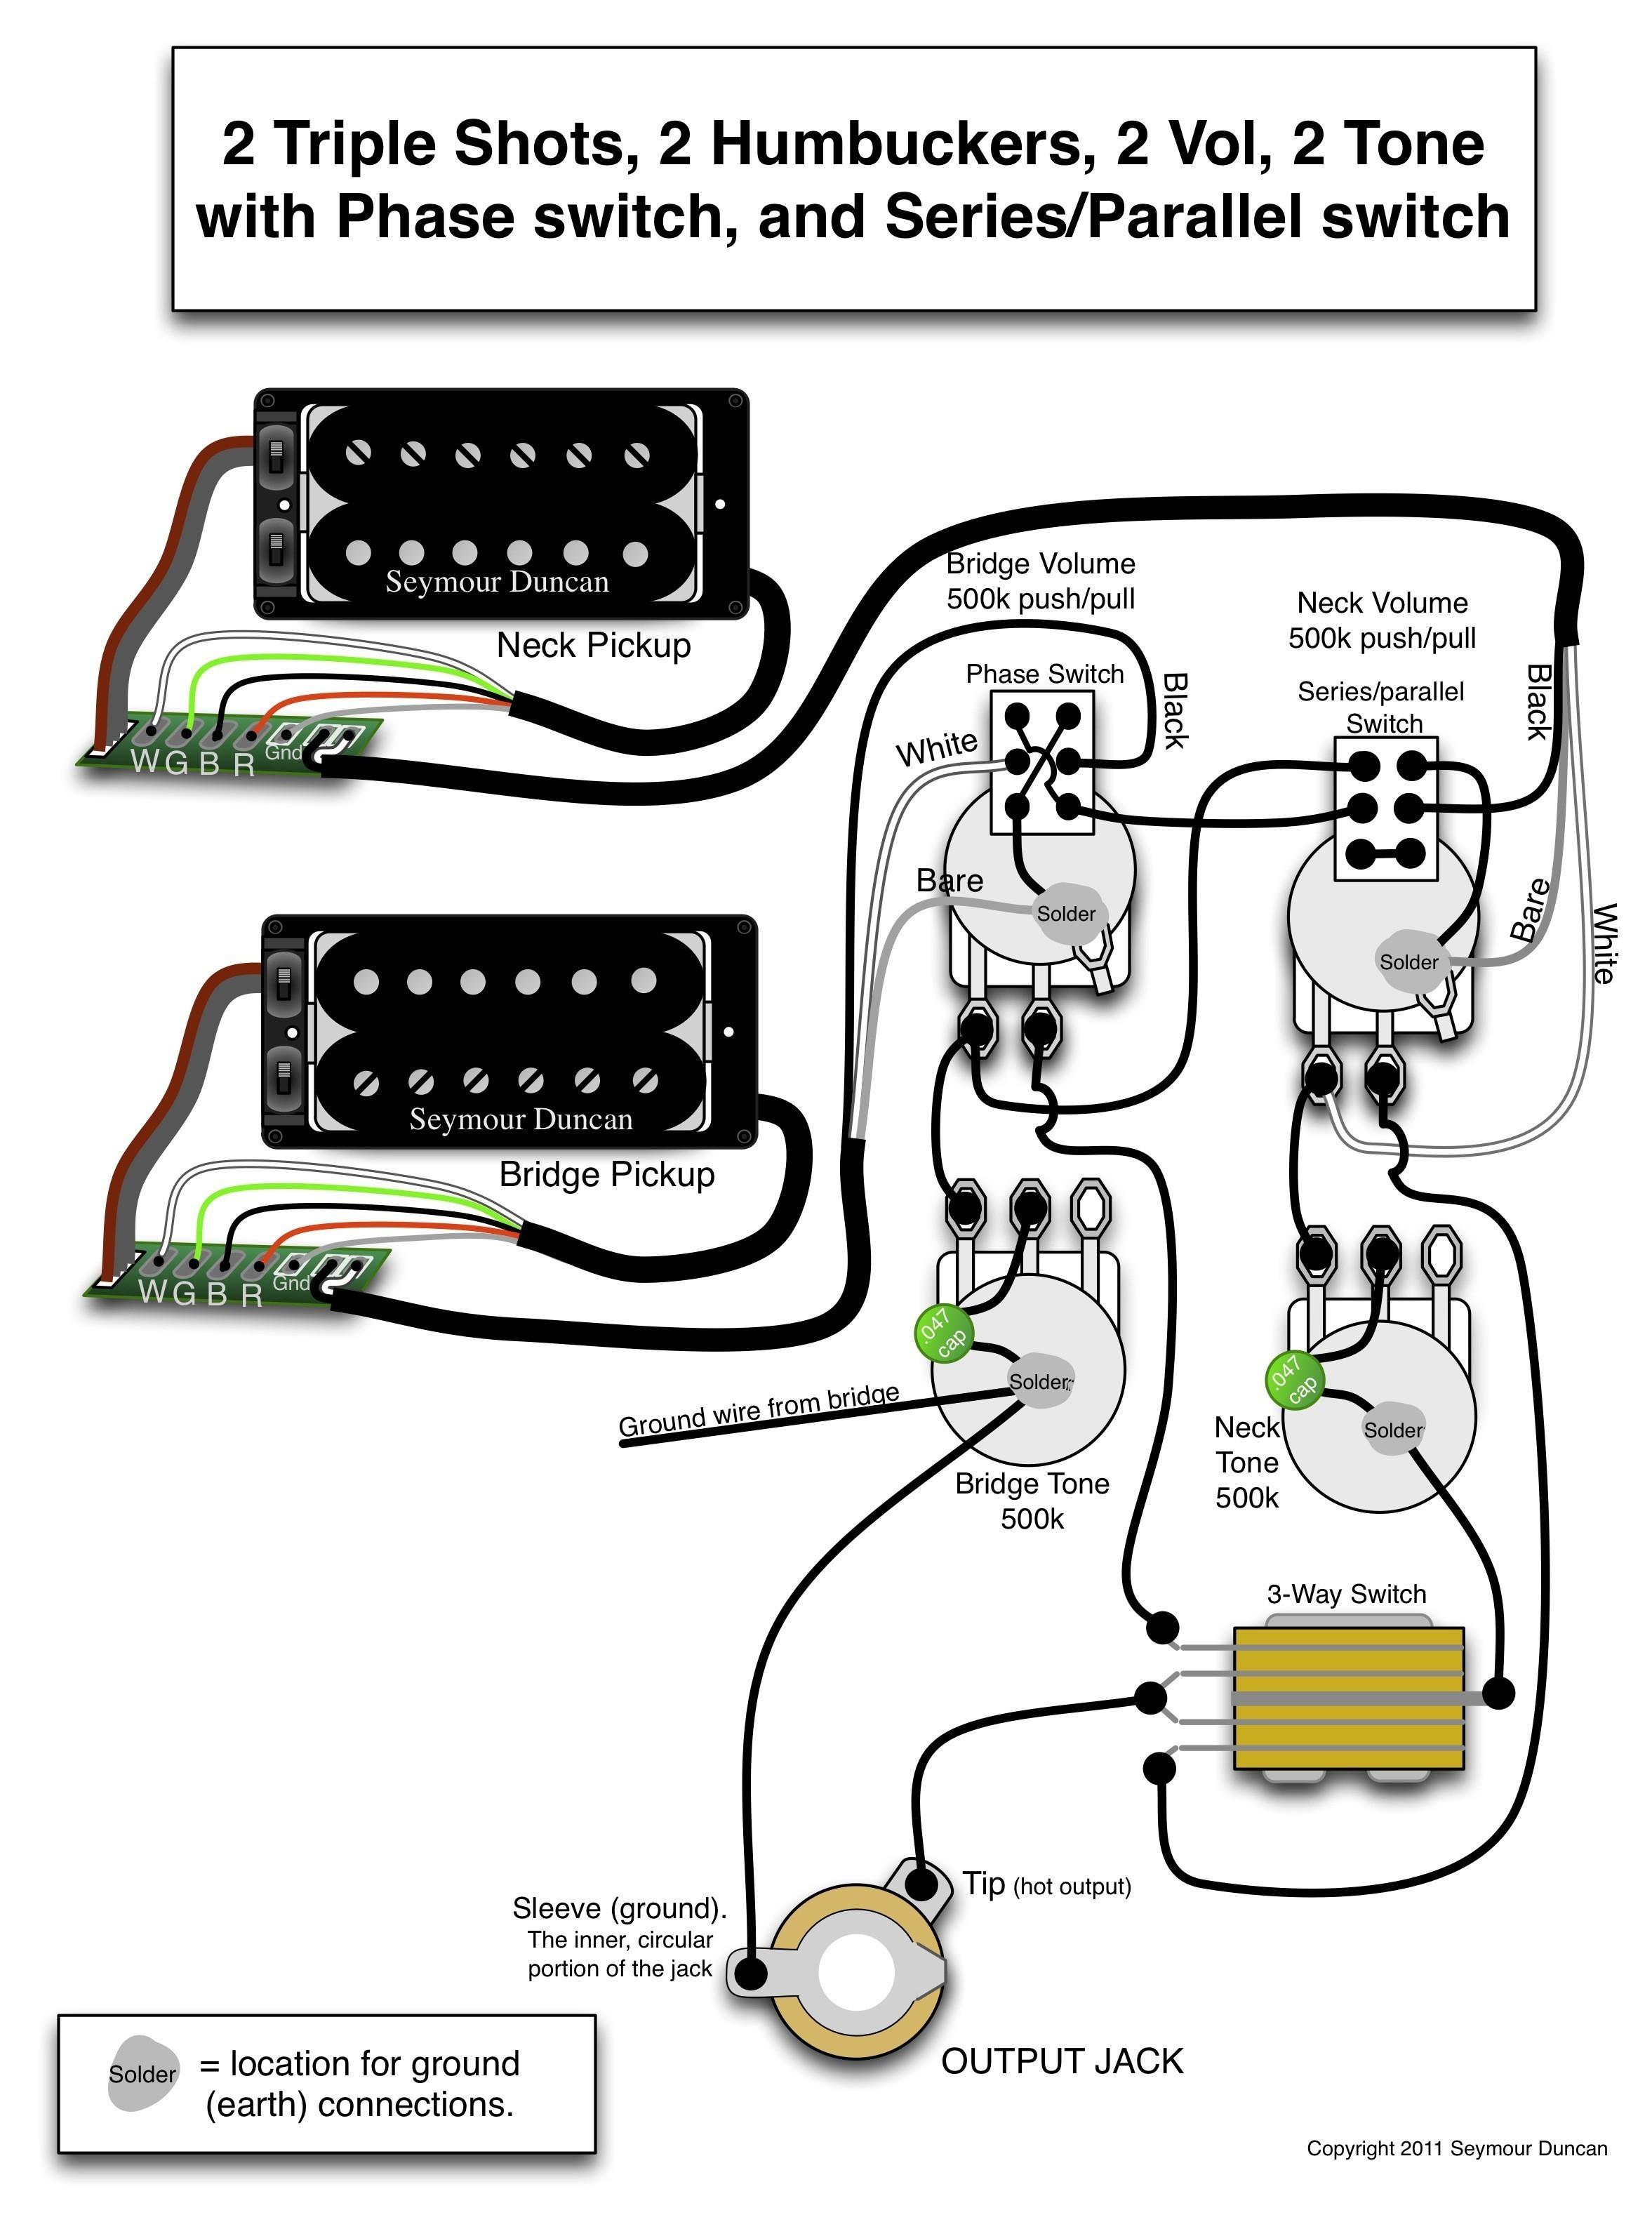 Wiring Diagram for Gibson Les Paul Guitar Fresh EpiPhone Les Paul Pickup Wiring Diagram Best Les